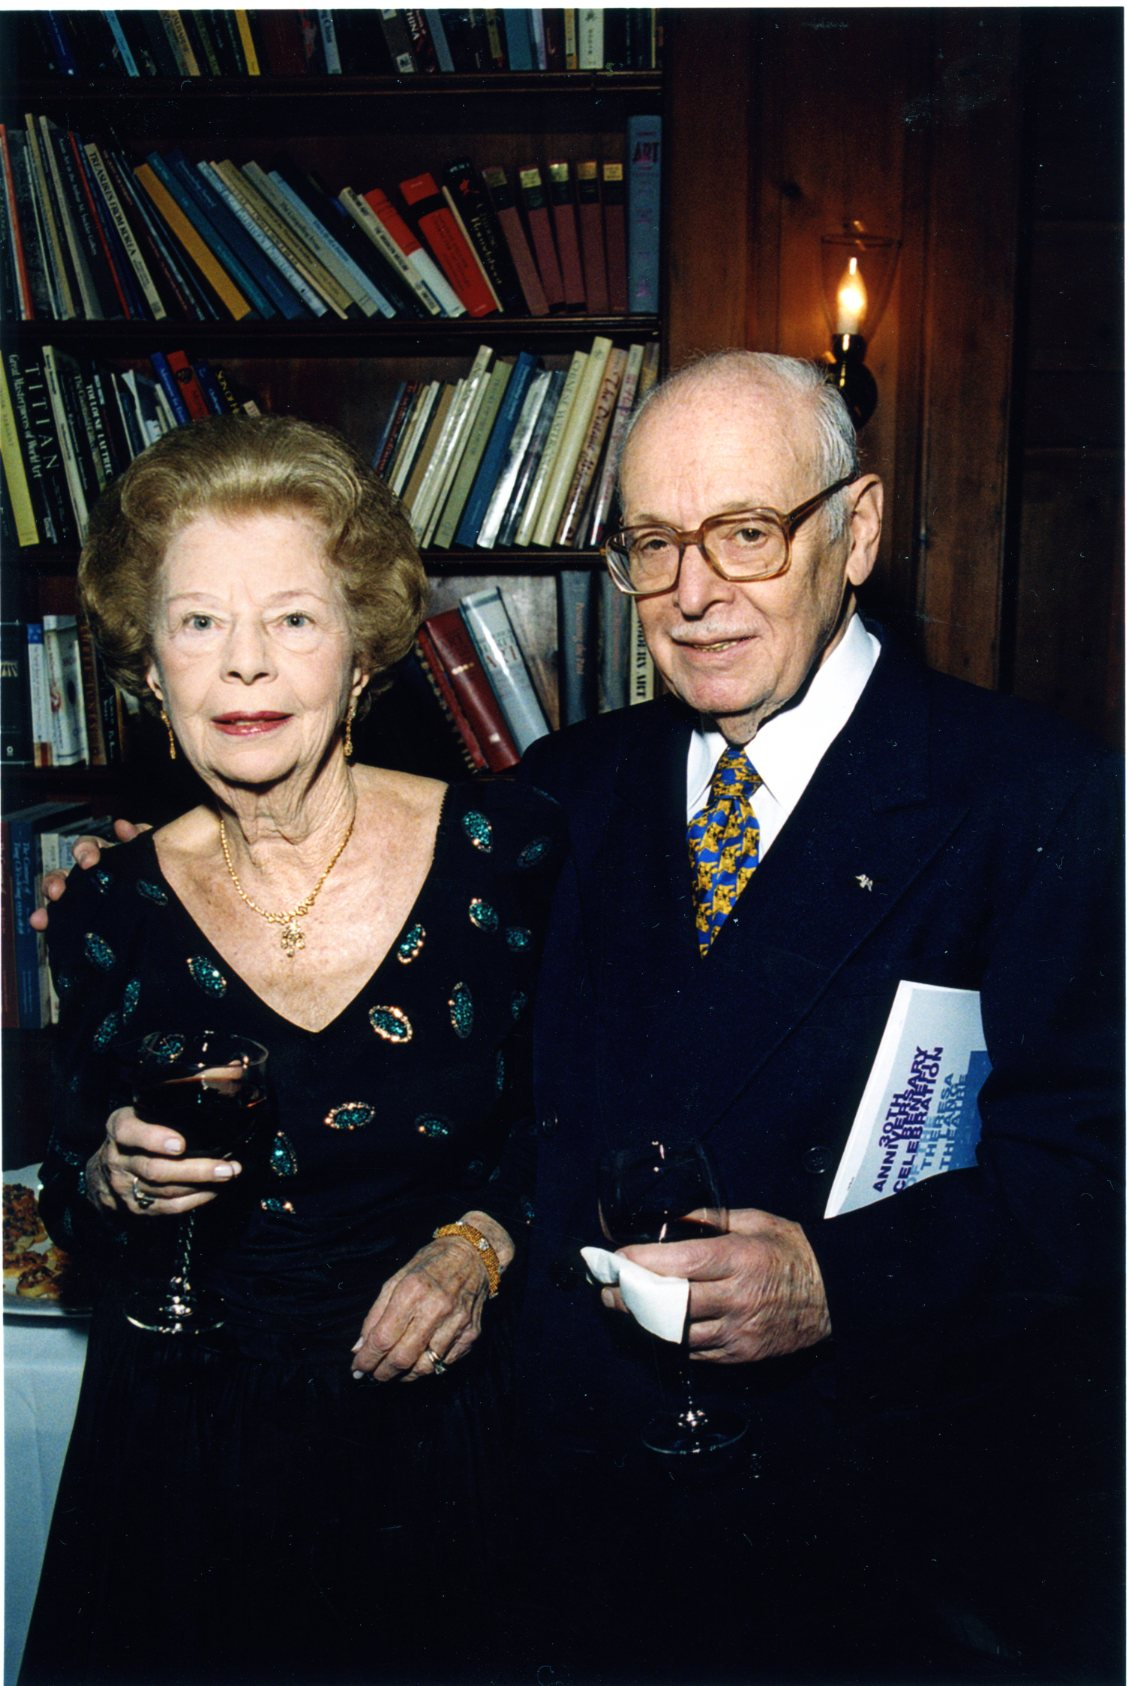 Theresa and Eugene Lang, January 29, 2001, at reception before the dedication of the Theresa Lang Theatre.